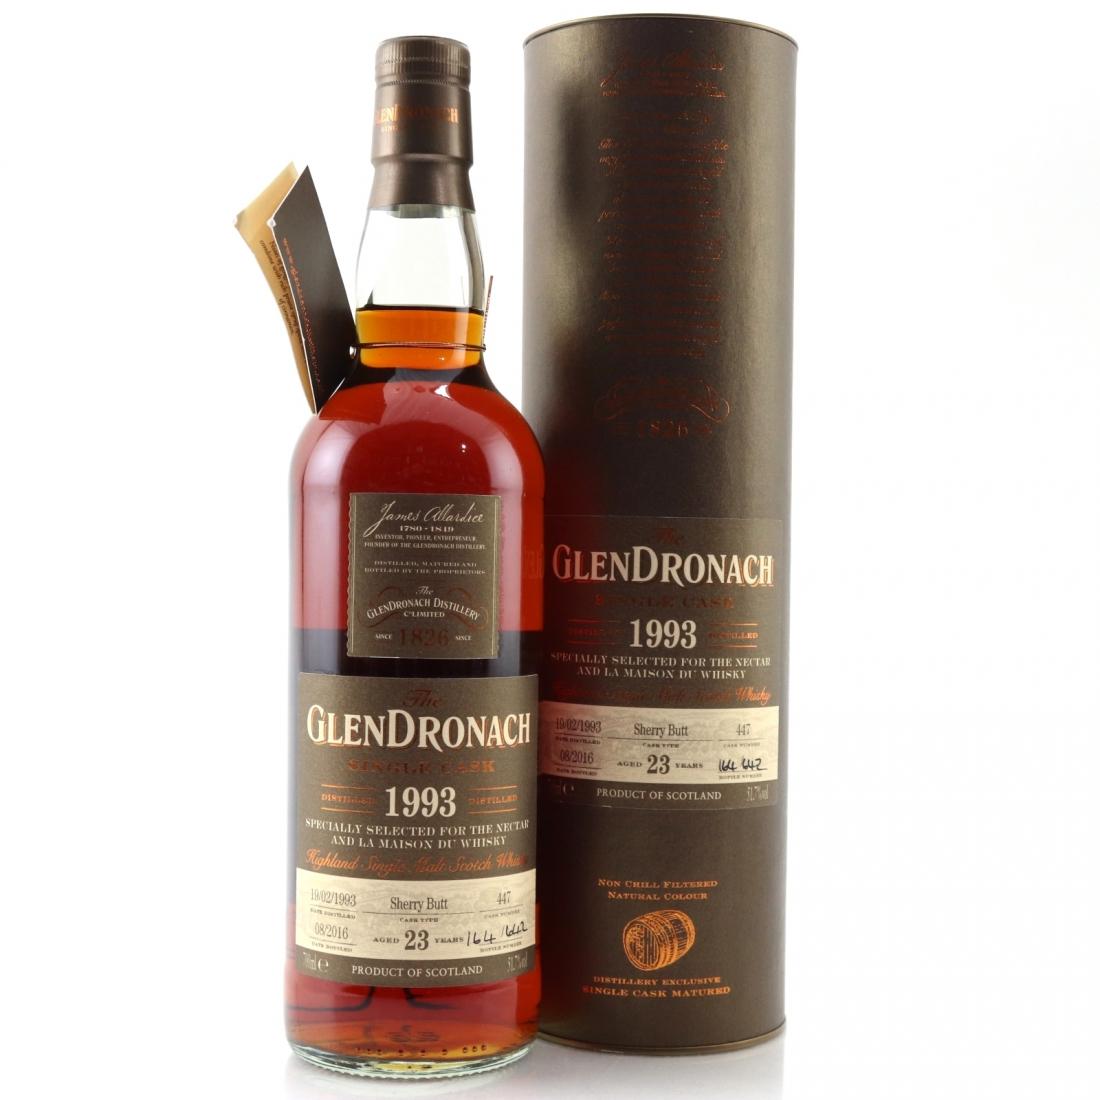 Glendronach 1993 Single Cask 23 Year Old #447